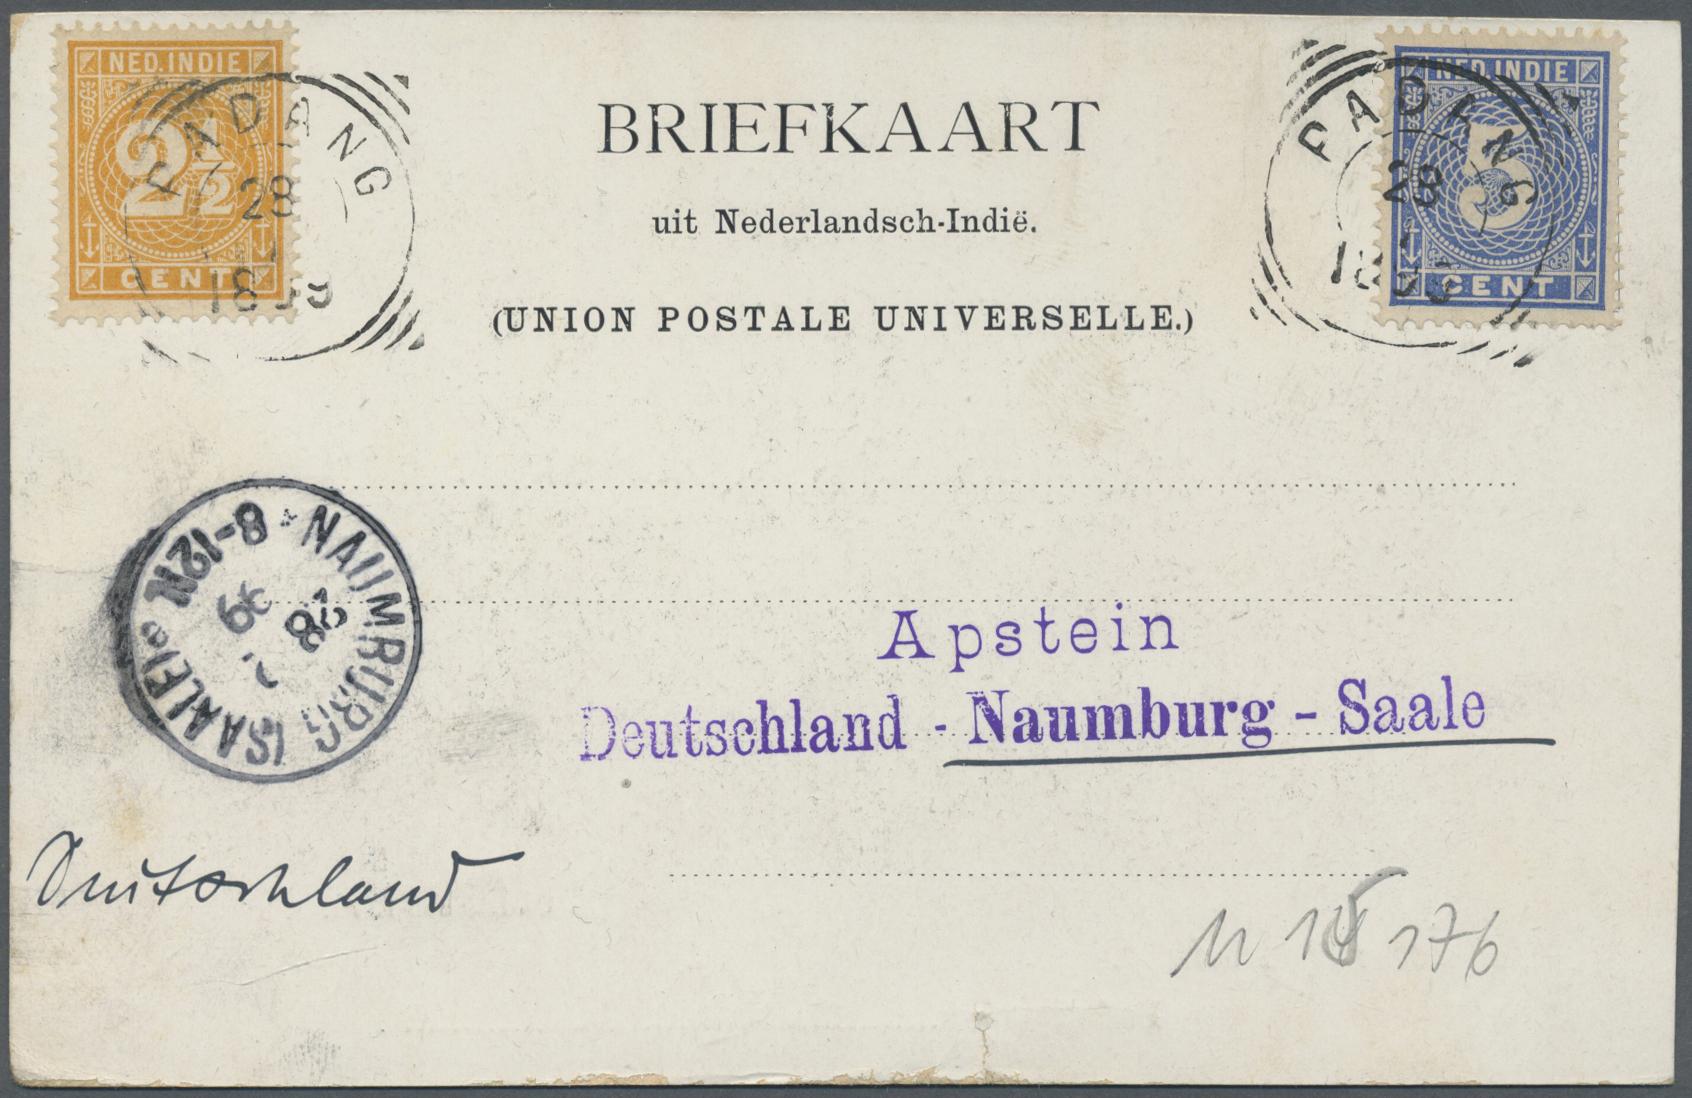 Lot 11013 - thematik: antarktis / antarctic  -  Auktionshaus Christoph Gärtner GmbH & Co. KG Single lots Philately Overseas & Europe. Auction #39 Day 4